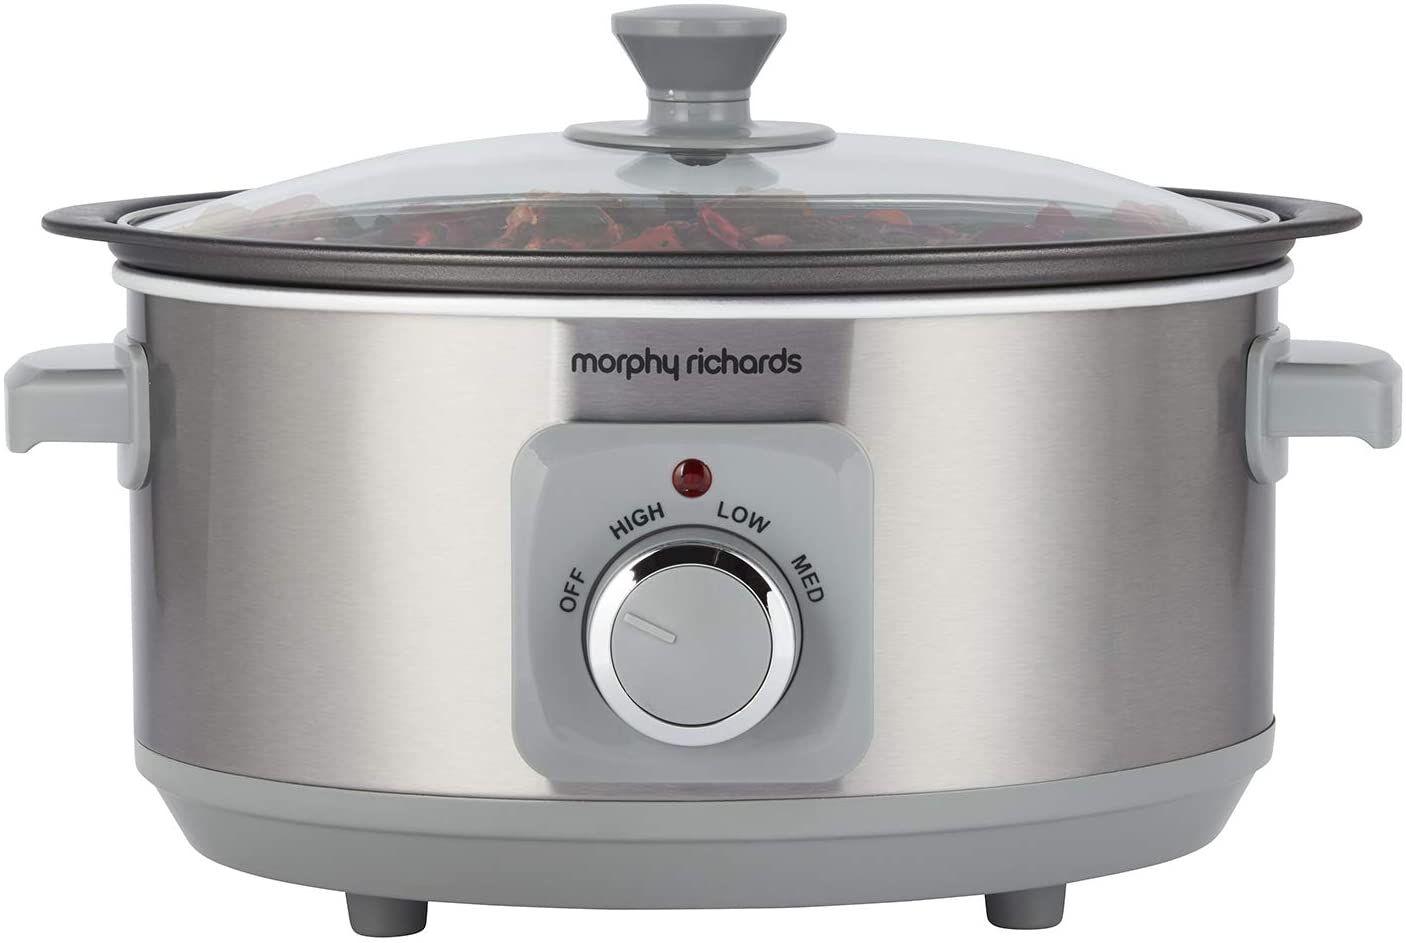 Morphy Richards 460018 Sear & Stew 3.5 Litre Aluminium Slow Cooker, One-Pot Solution - £16.99 prime/+£4.49 Non Prime @ Amazon